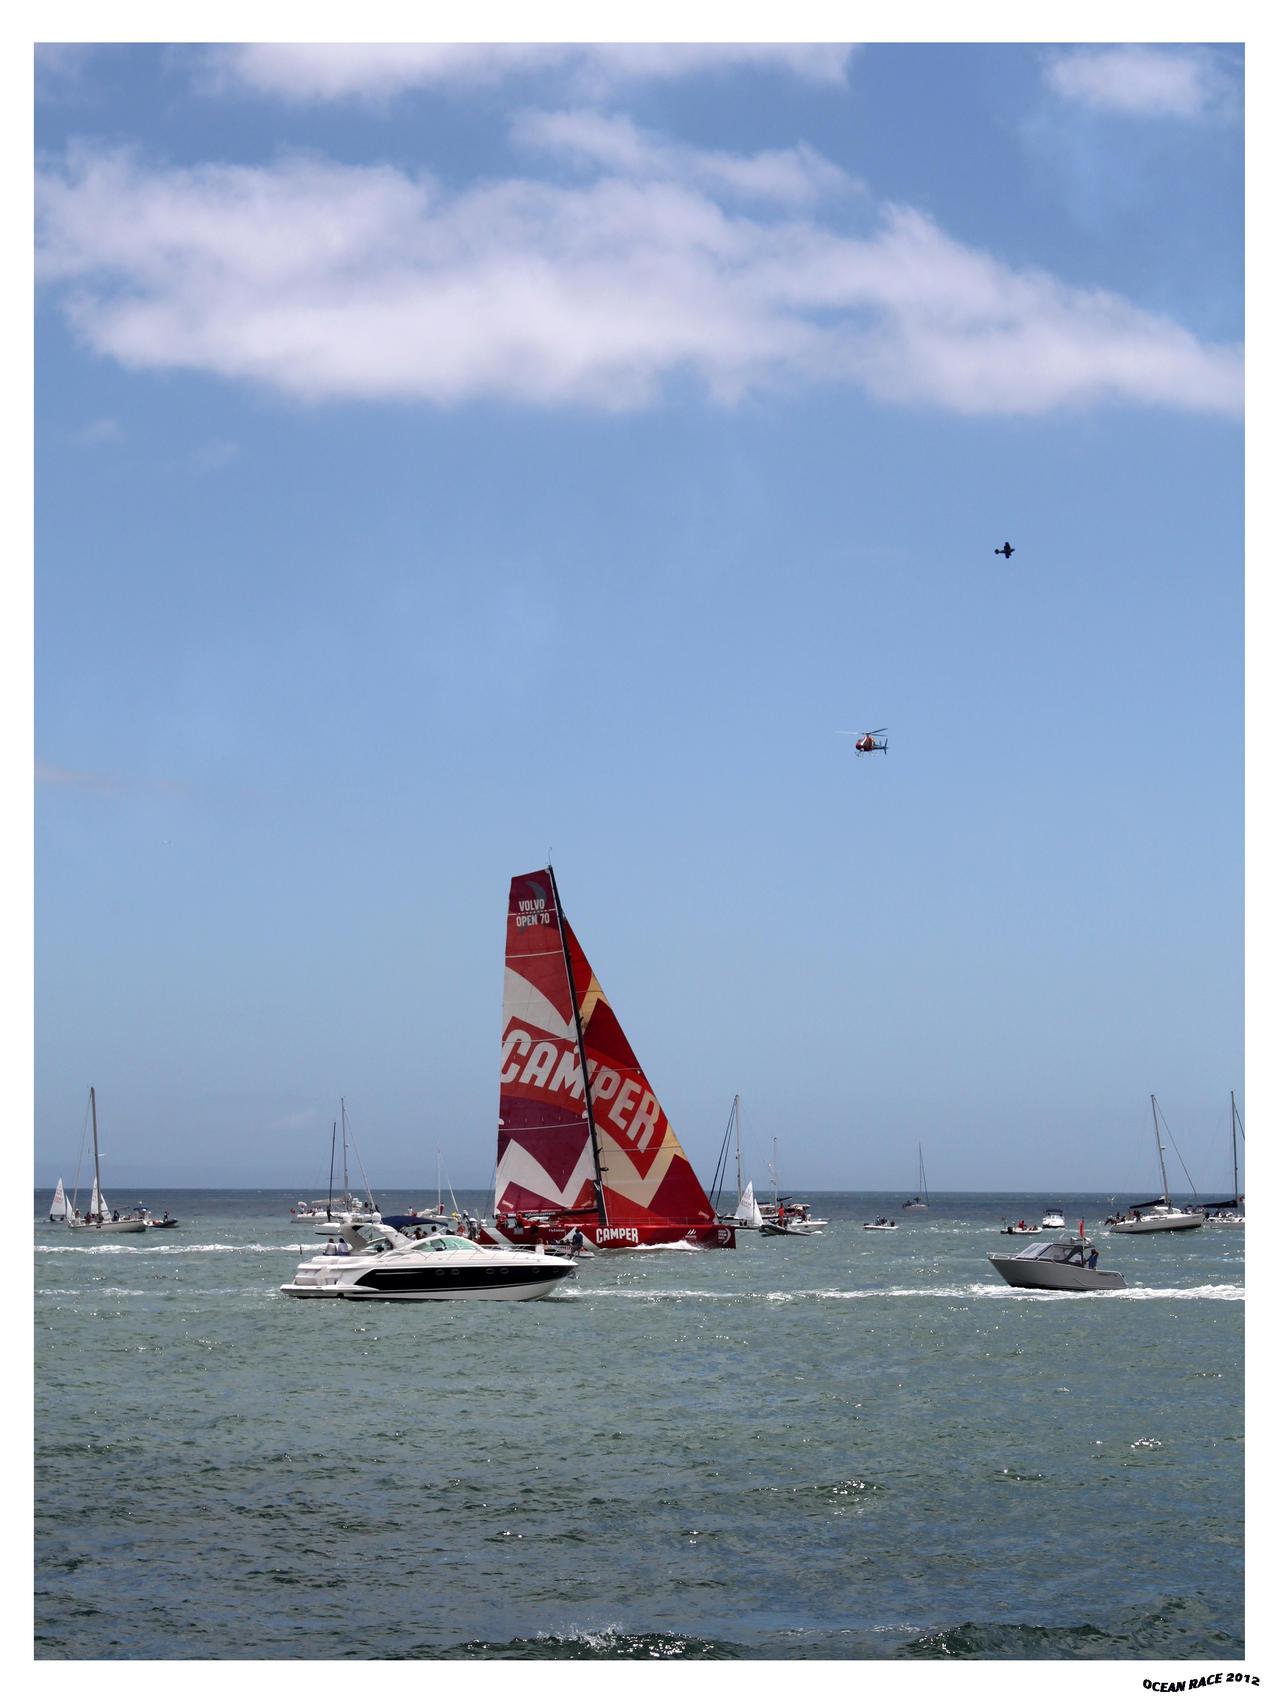 Volvo Ocean Race 2012 by jotamyg